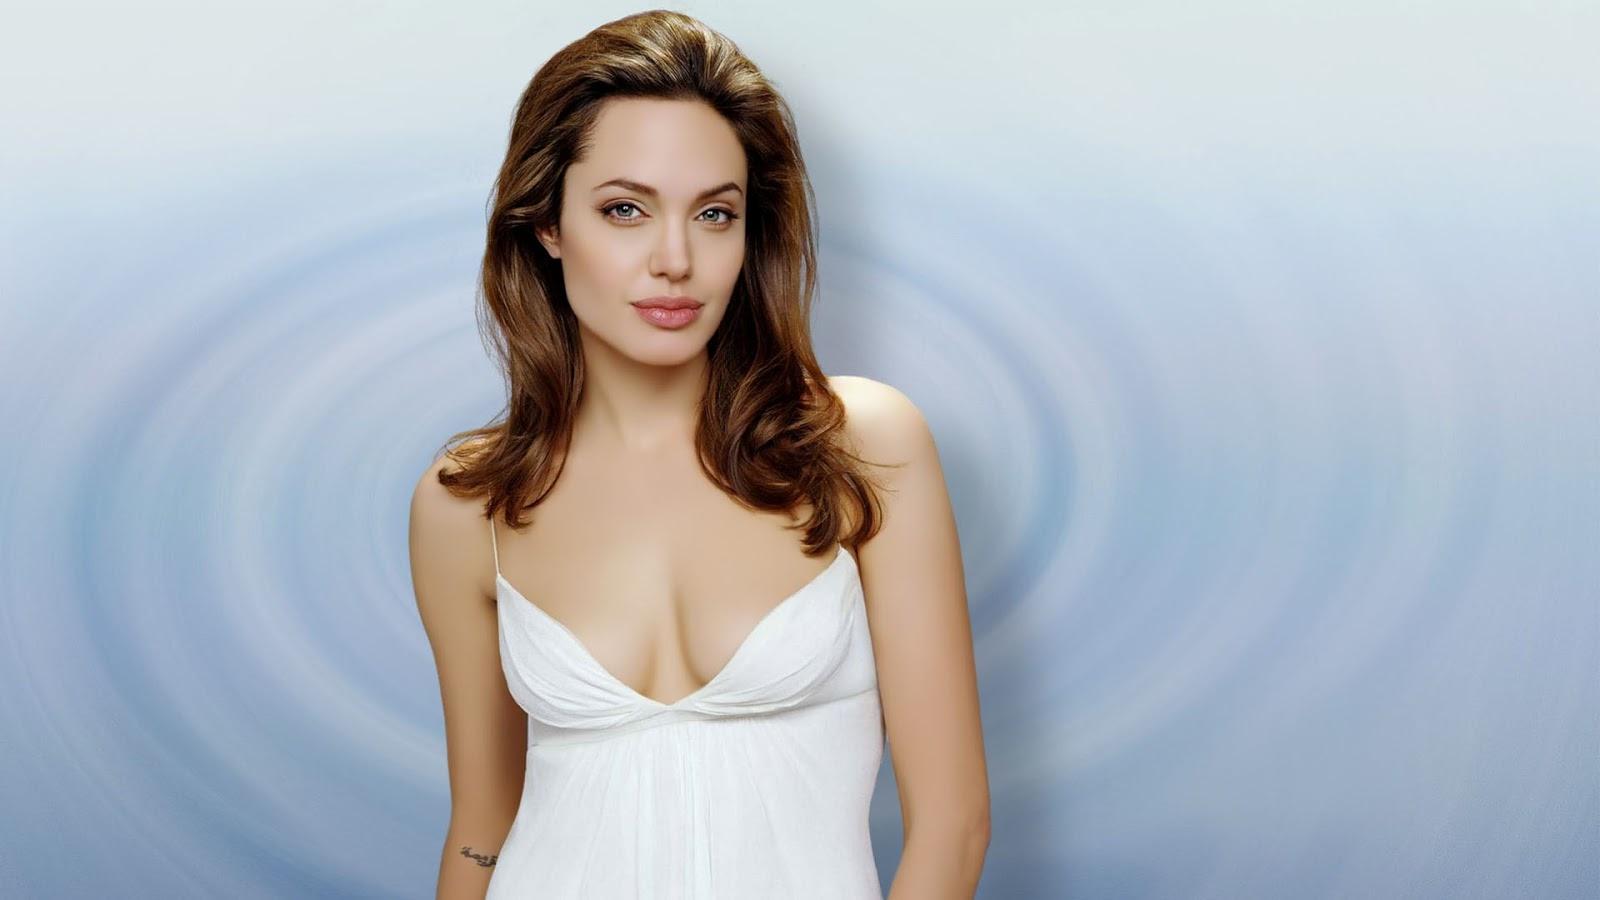 Angelina Jolie Hd Wallpapers: WALL PC: Angelina Jolie Wallpaper